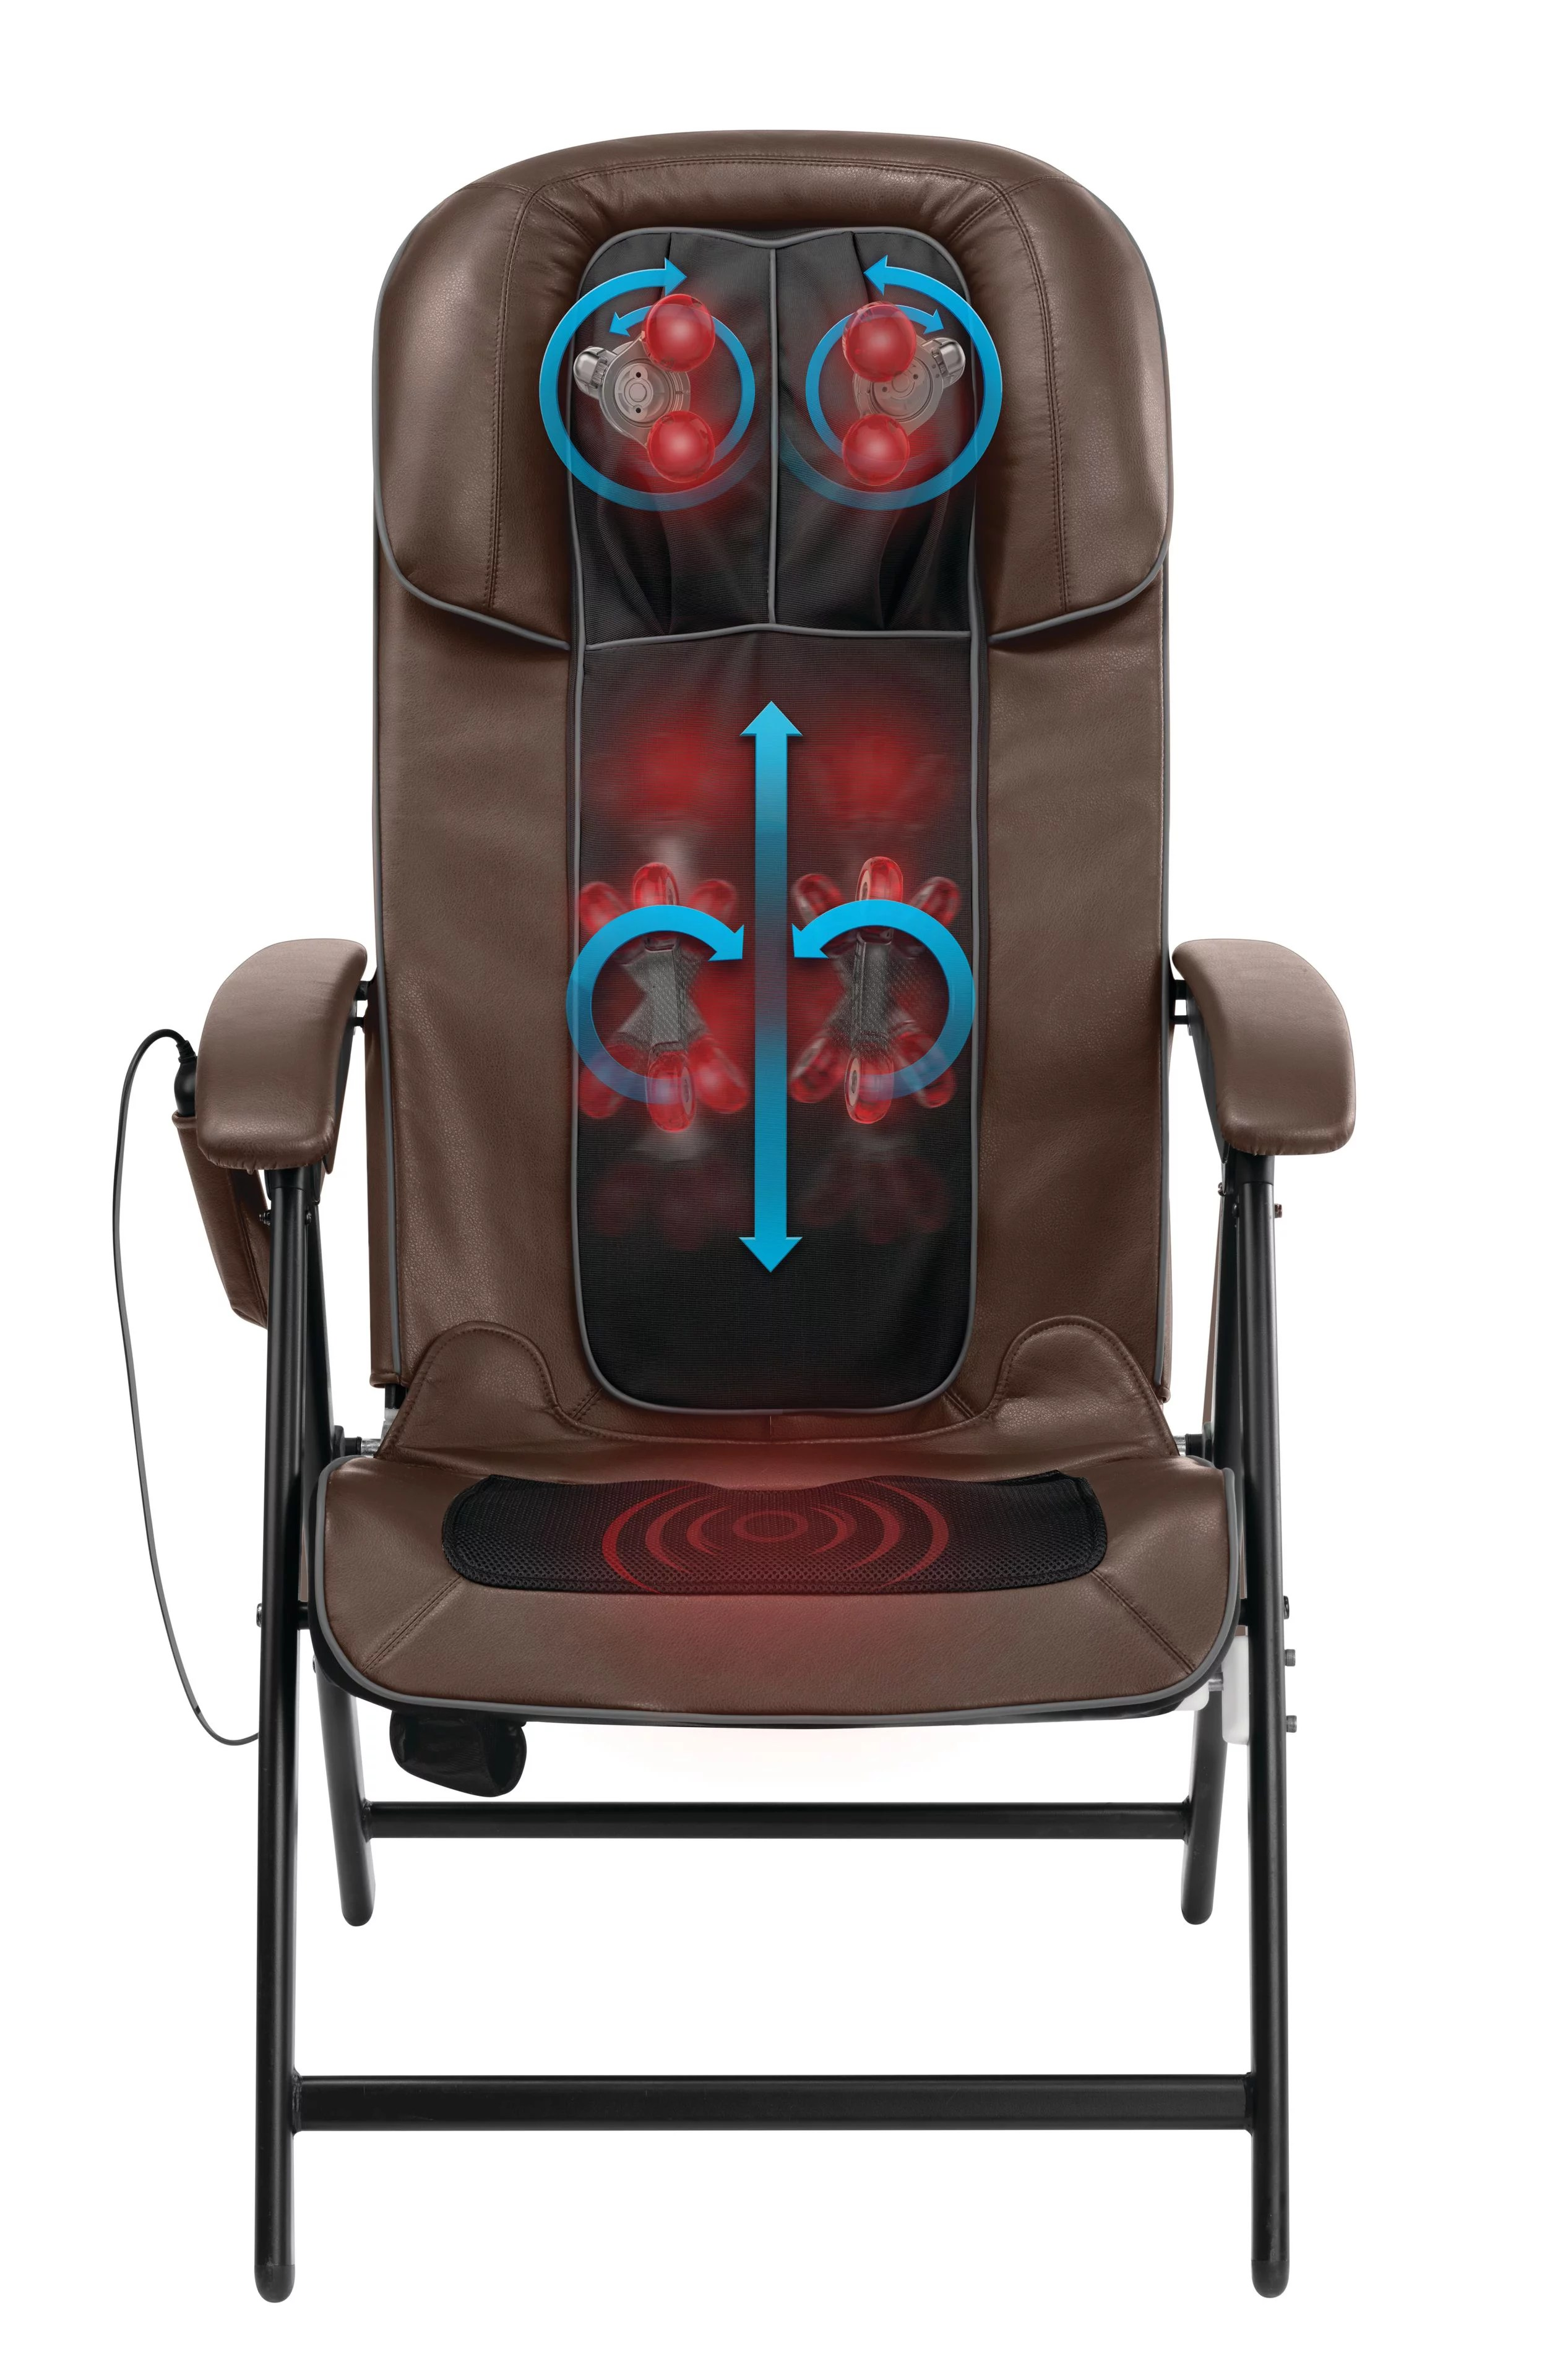 back massage chair graco doll high set homedics easy lounge shiatsu folding mcs 1210h walmart com